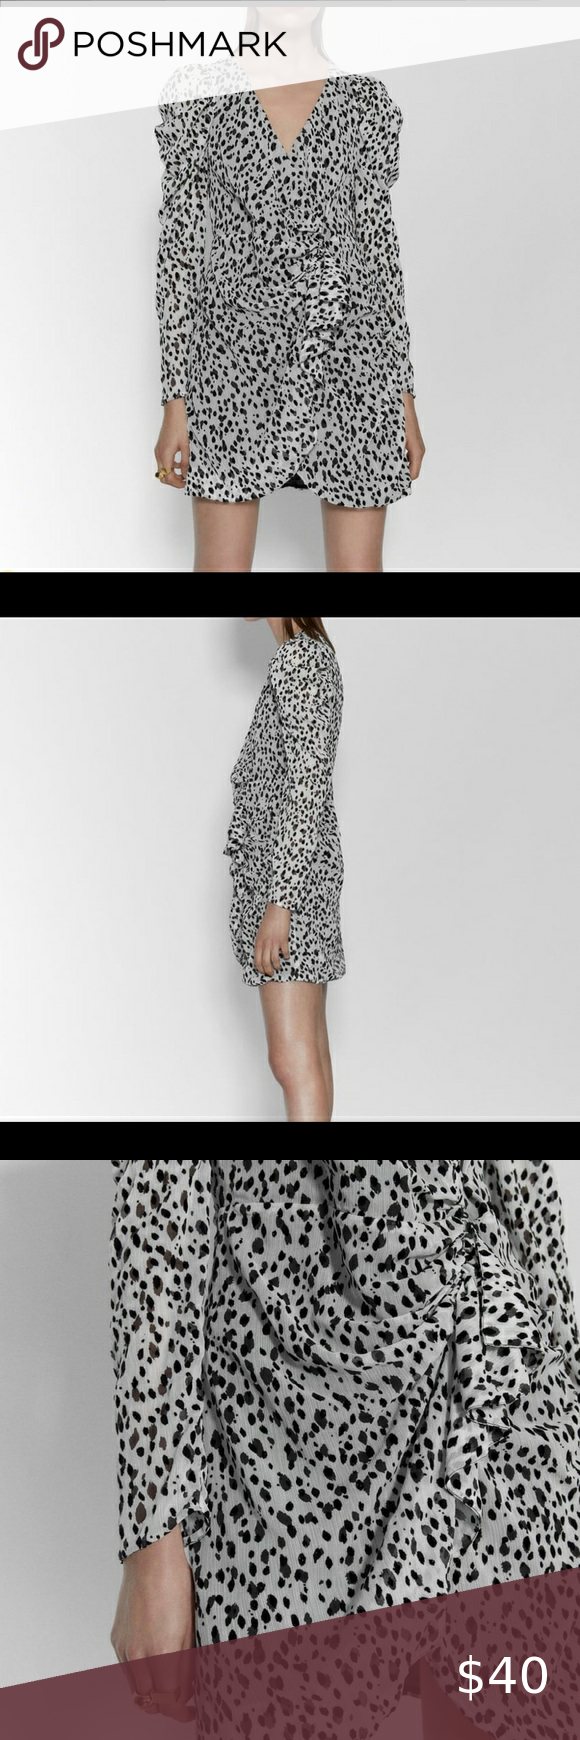 Zara Animal Print Mini Dress Ever Worn Ruffles Long Puff Sleeves Black And White Leopard Print Tag Animal Print Mini Dresses Printed Mini Dress Fashion [ 1740 x 580 Pixel ]